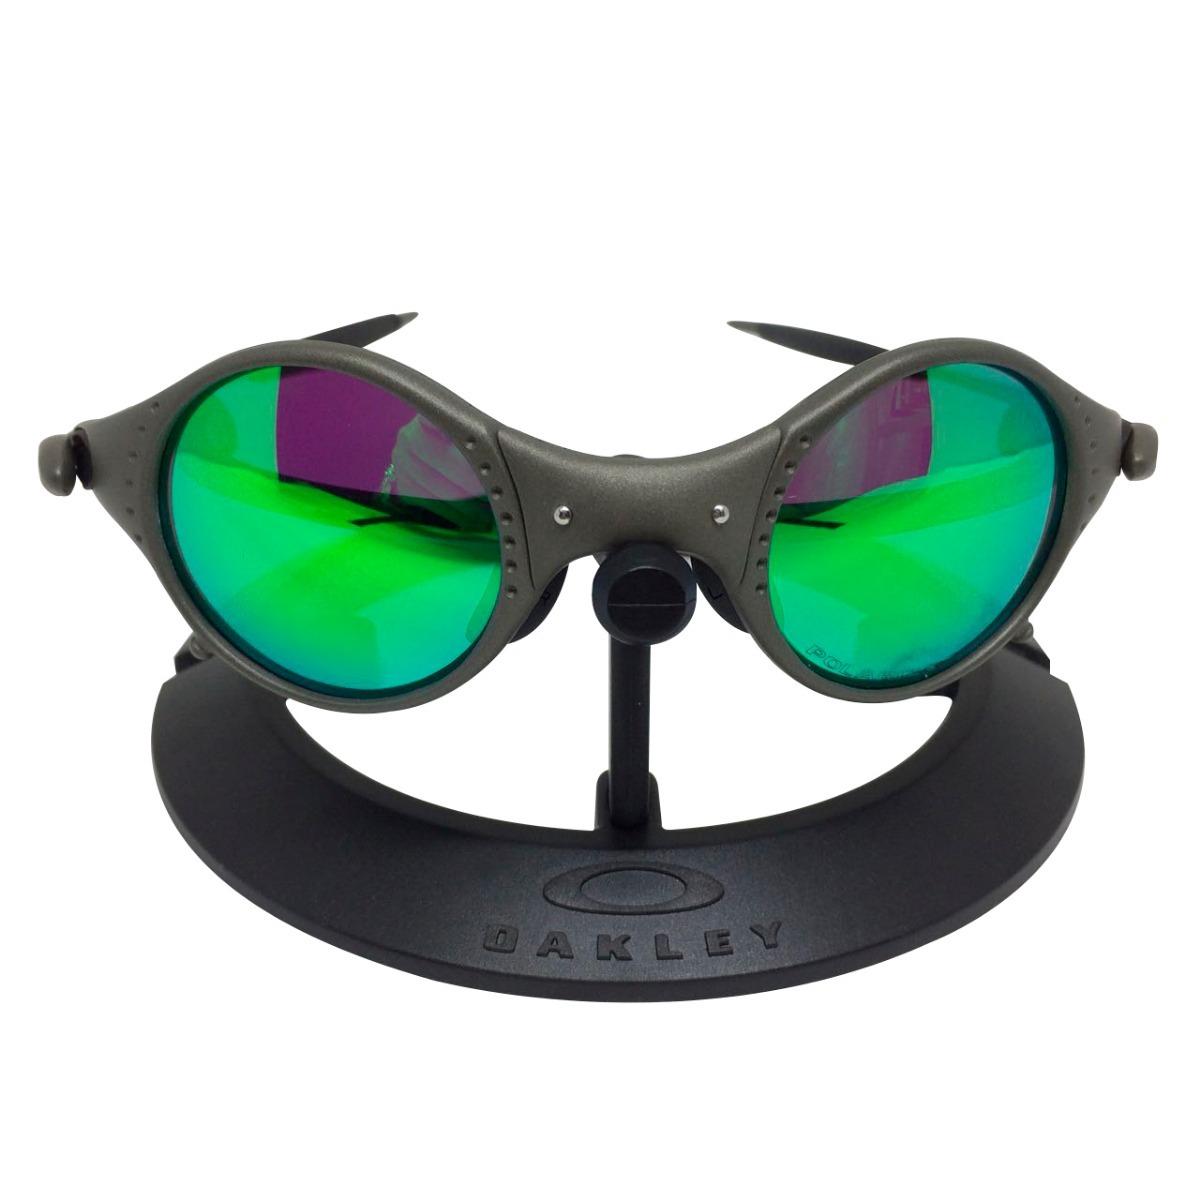 c50c07d96 Óculos Juliet Mars X-metal Verde Original Co00-0987 - R$ 149,00 em ...